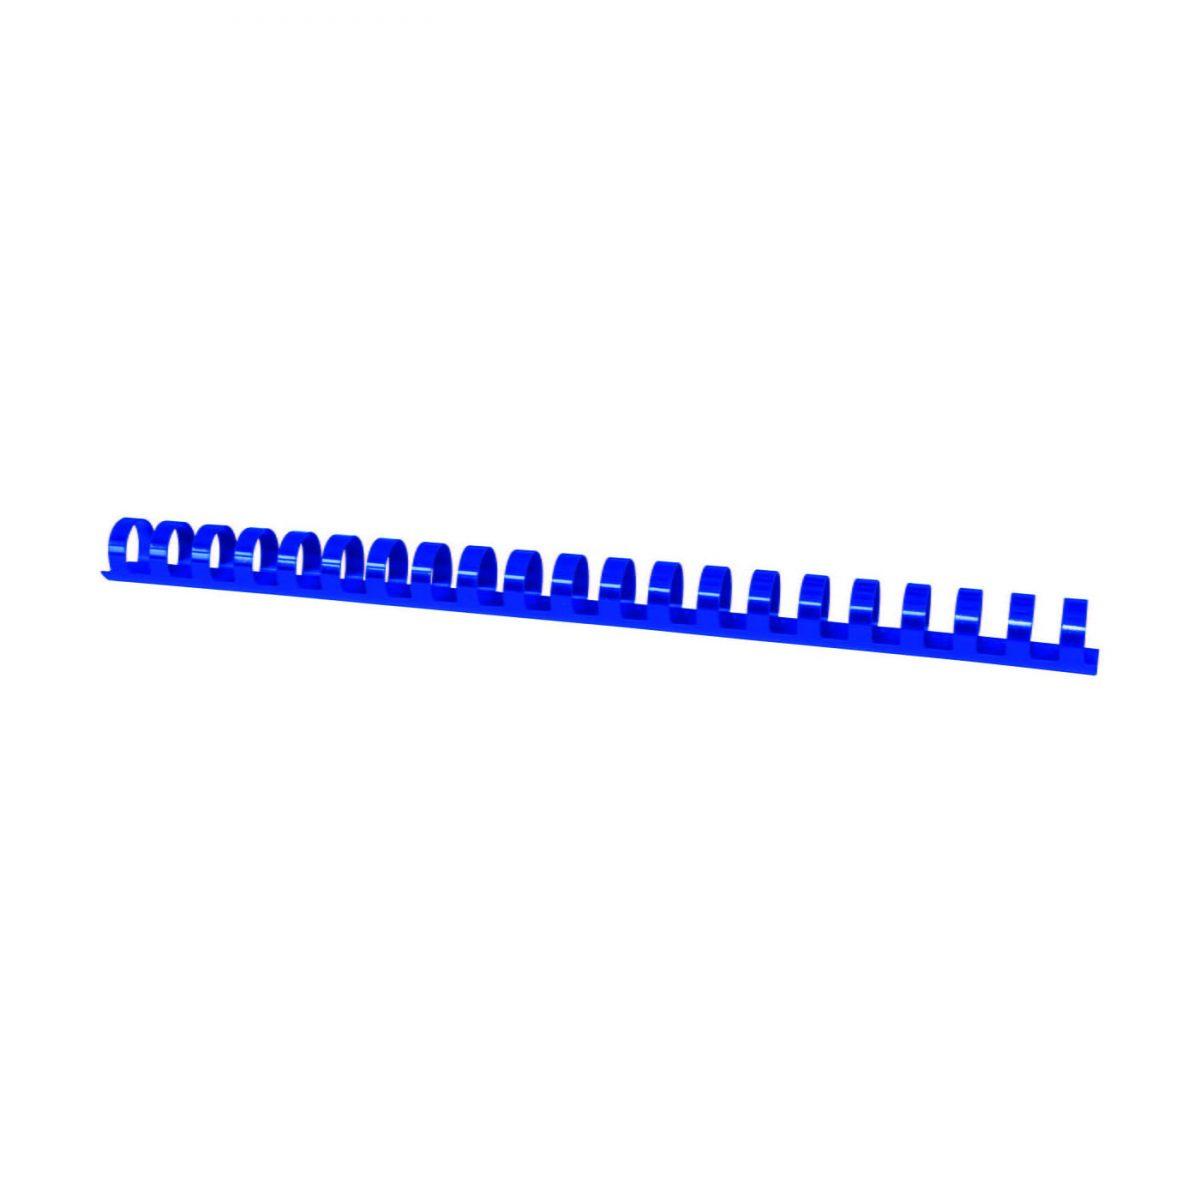 Inele plastic 16 mm, max 145 coli, 100buc/cut, Office Products